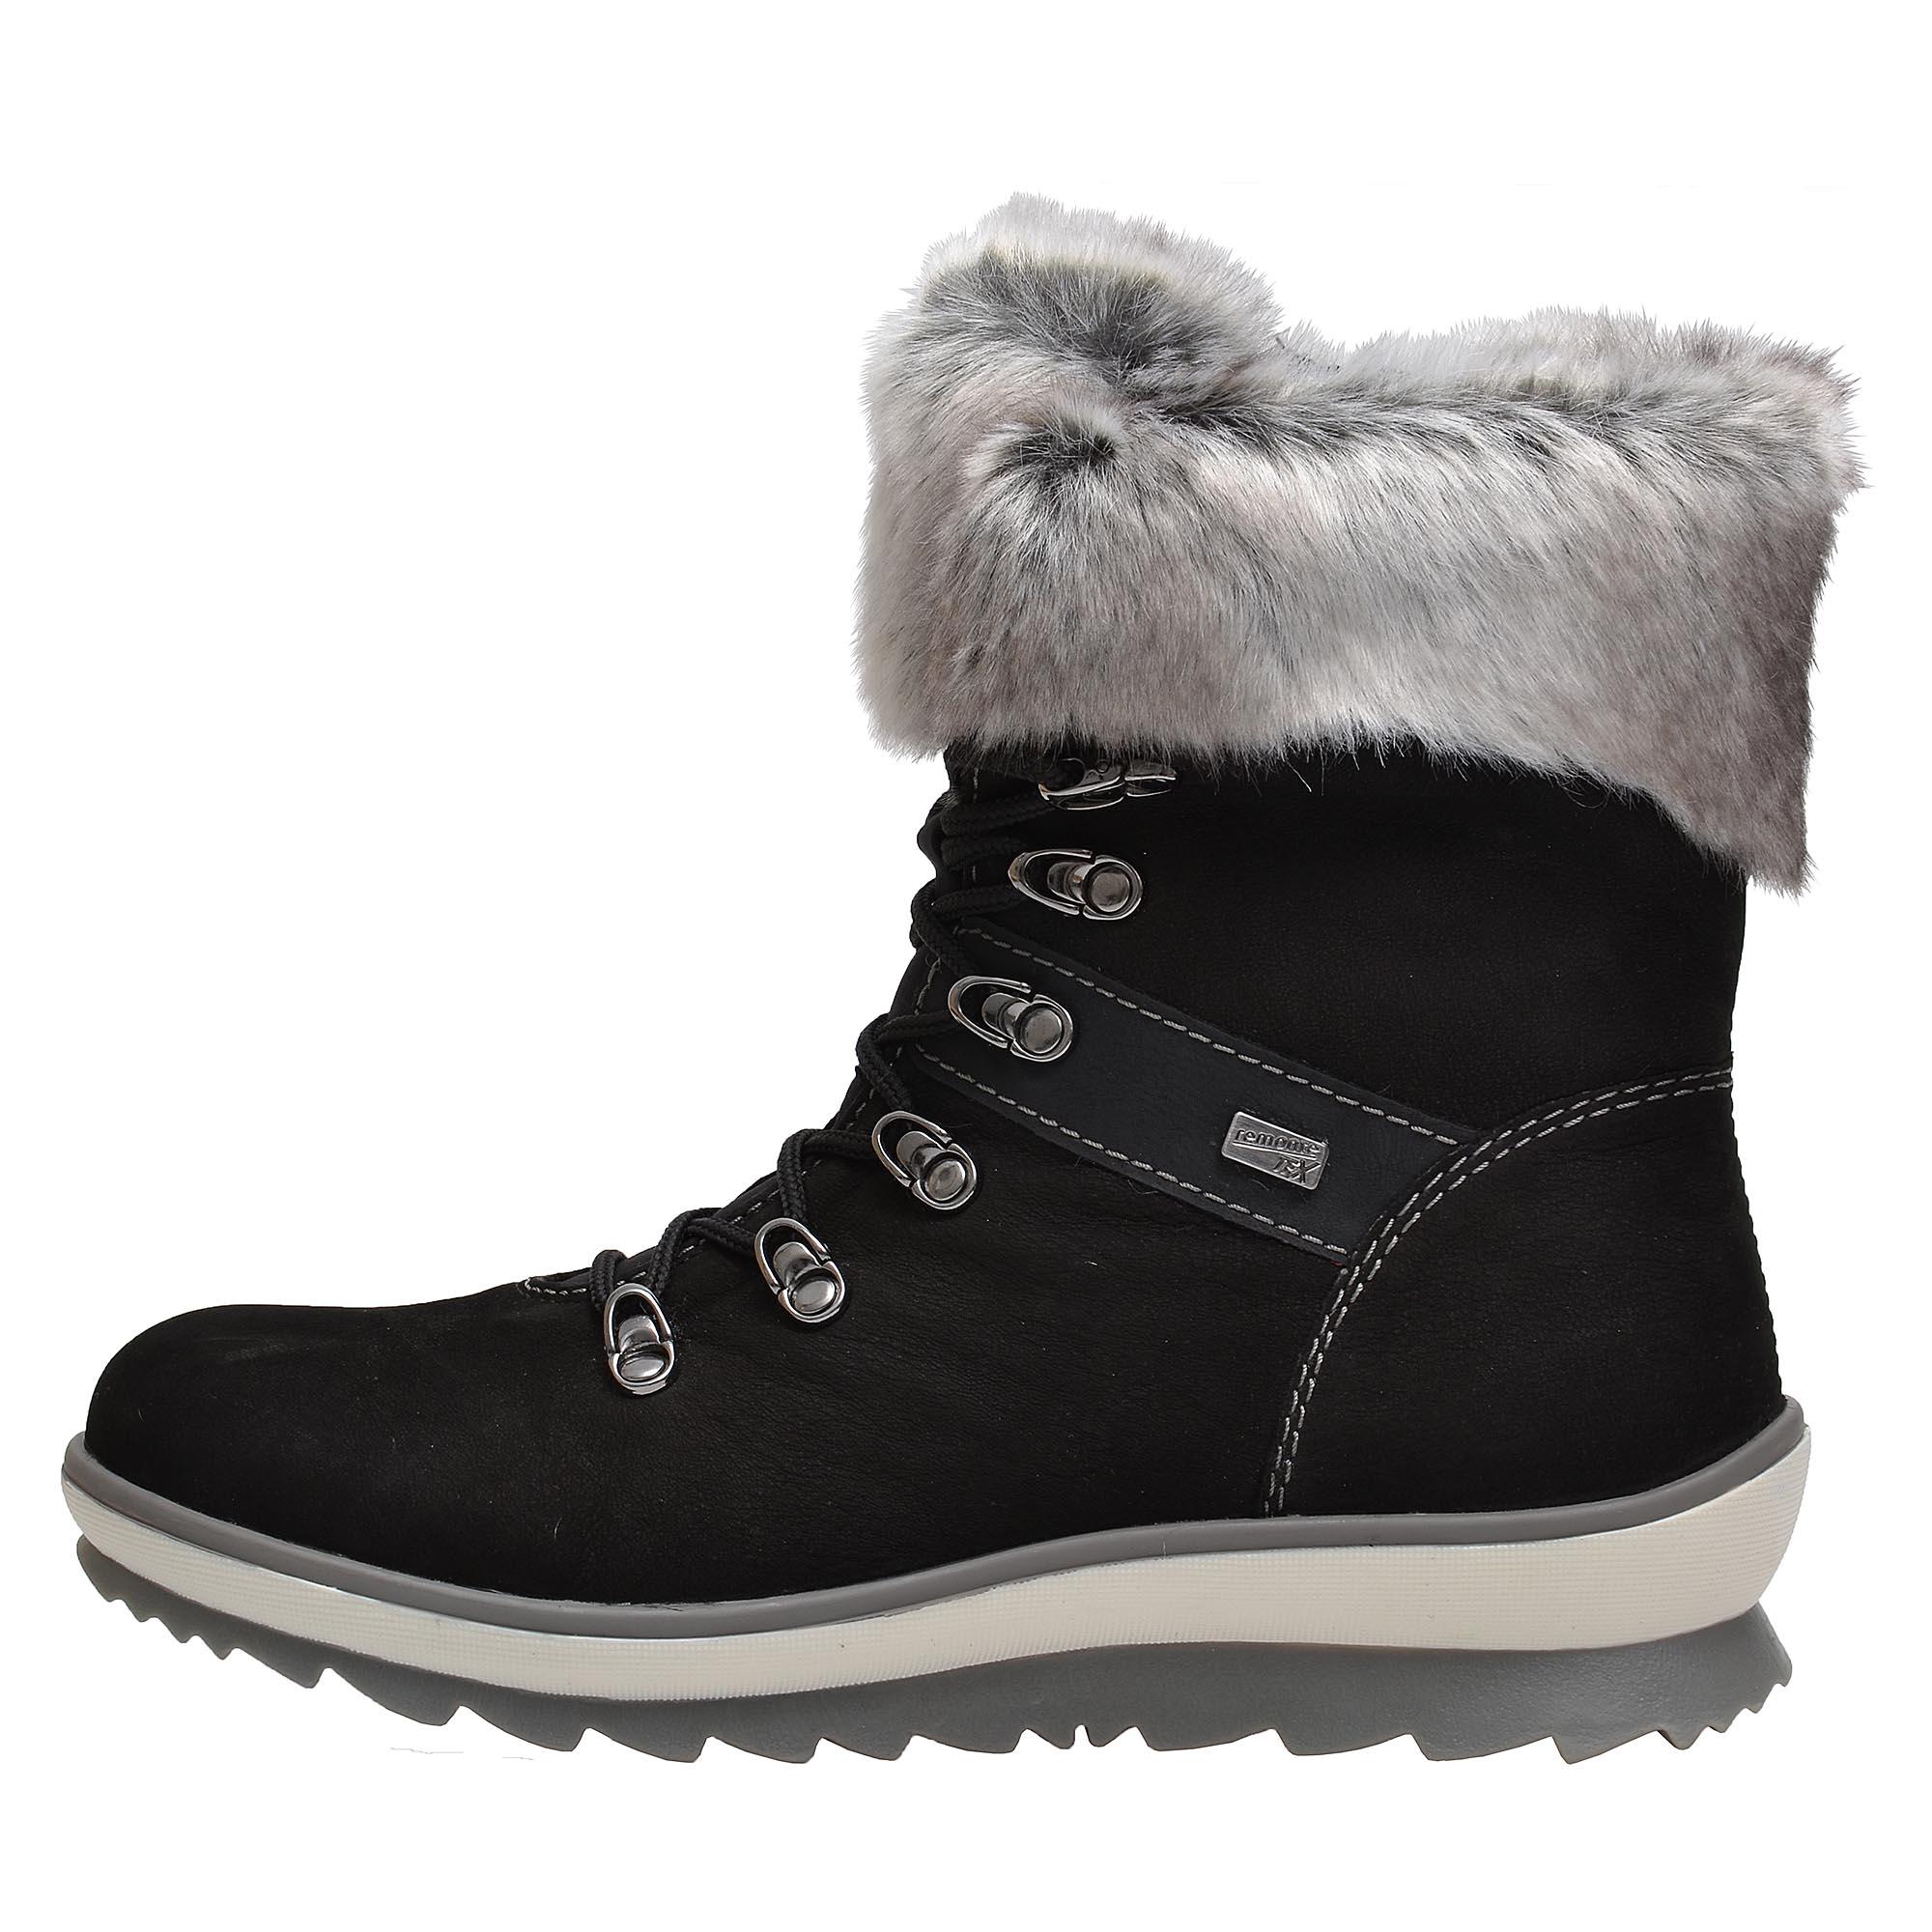 1c4700695382 detail Dámská obuv RIEKER - REMONTE br R4382 02 SCHWARZ KOMBI H